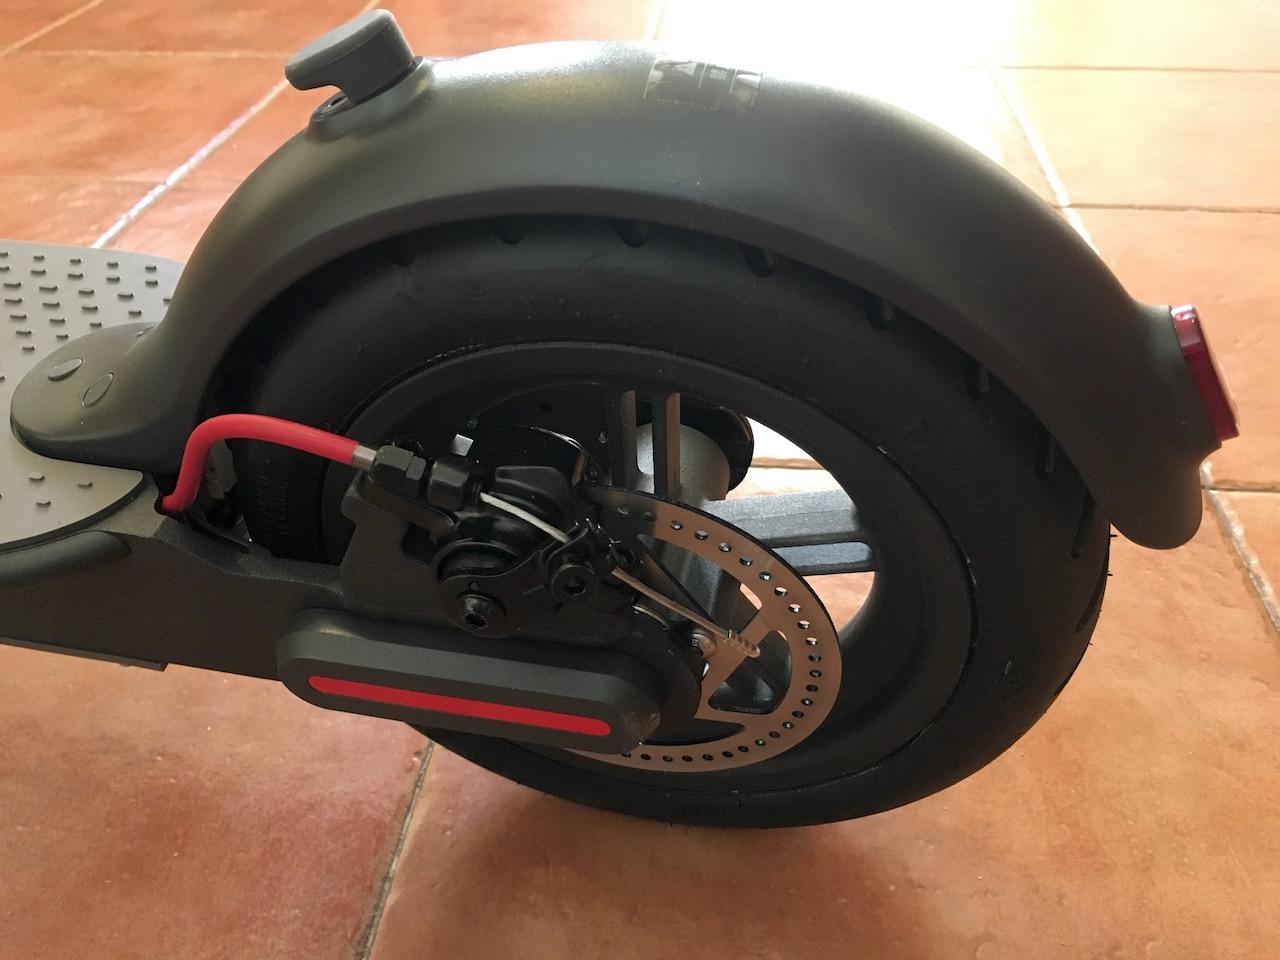 Mi Scooter M365